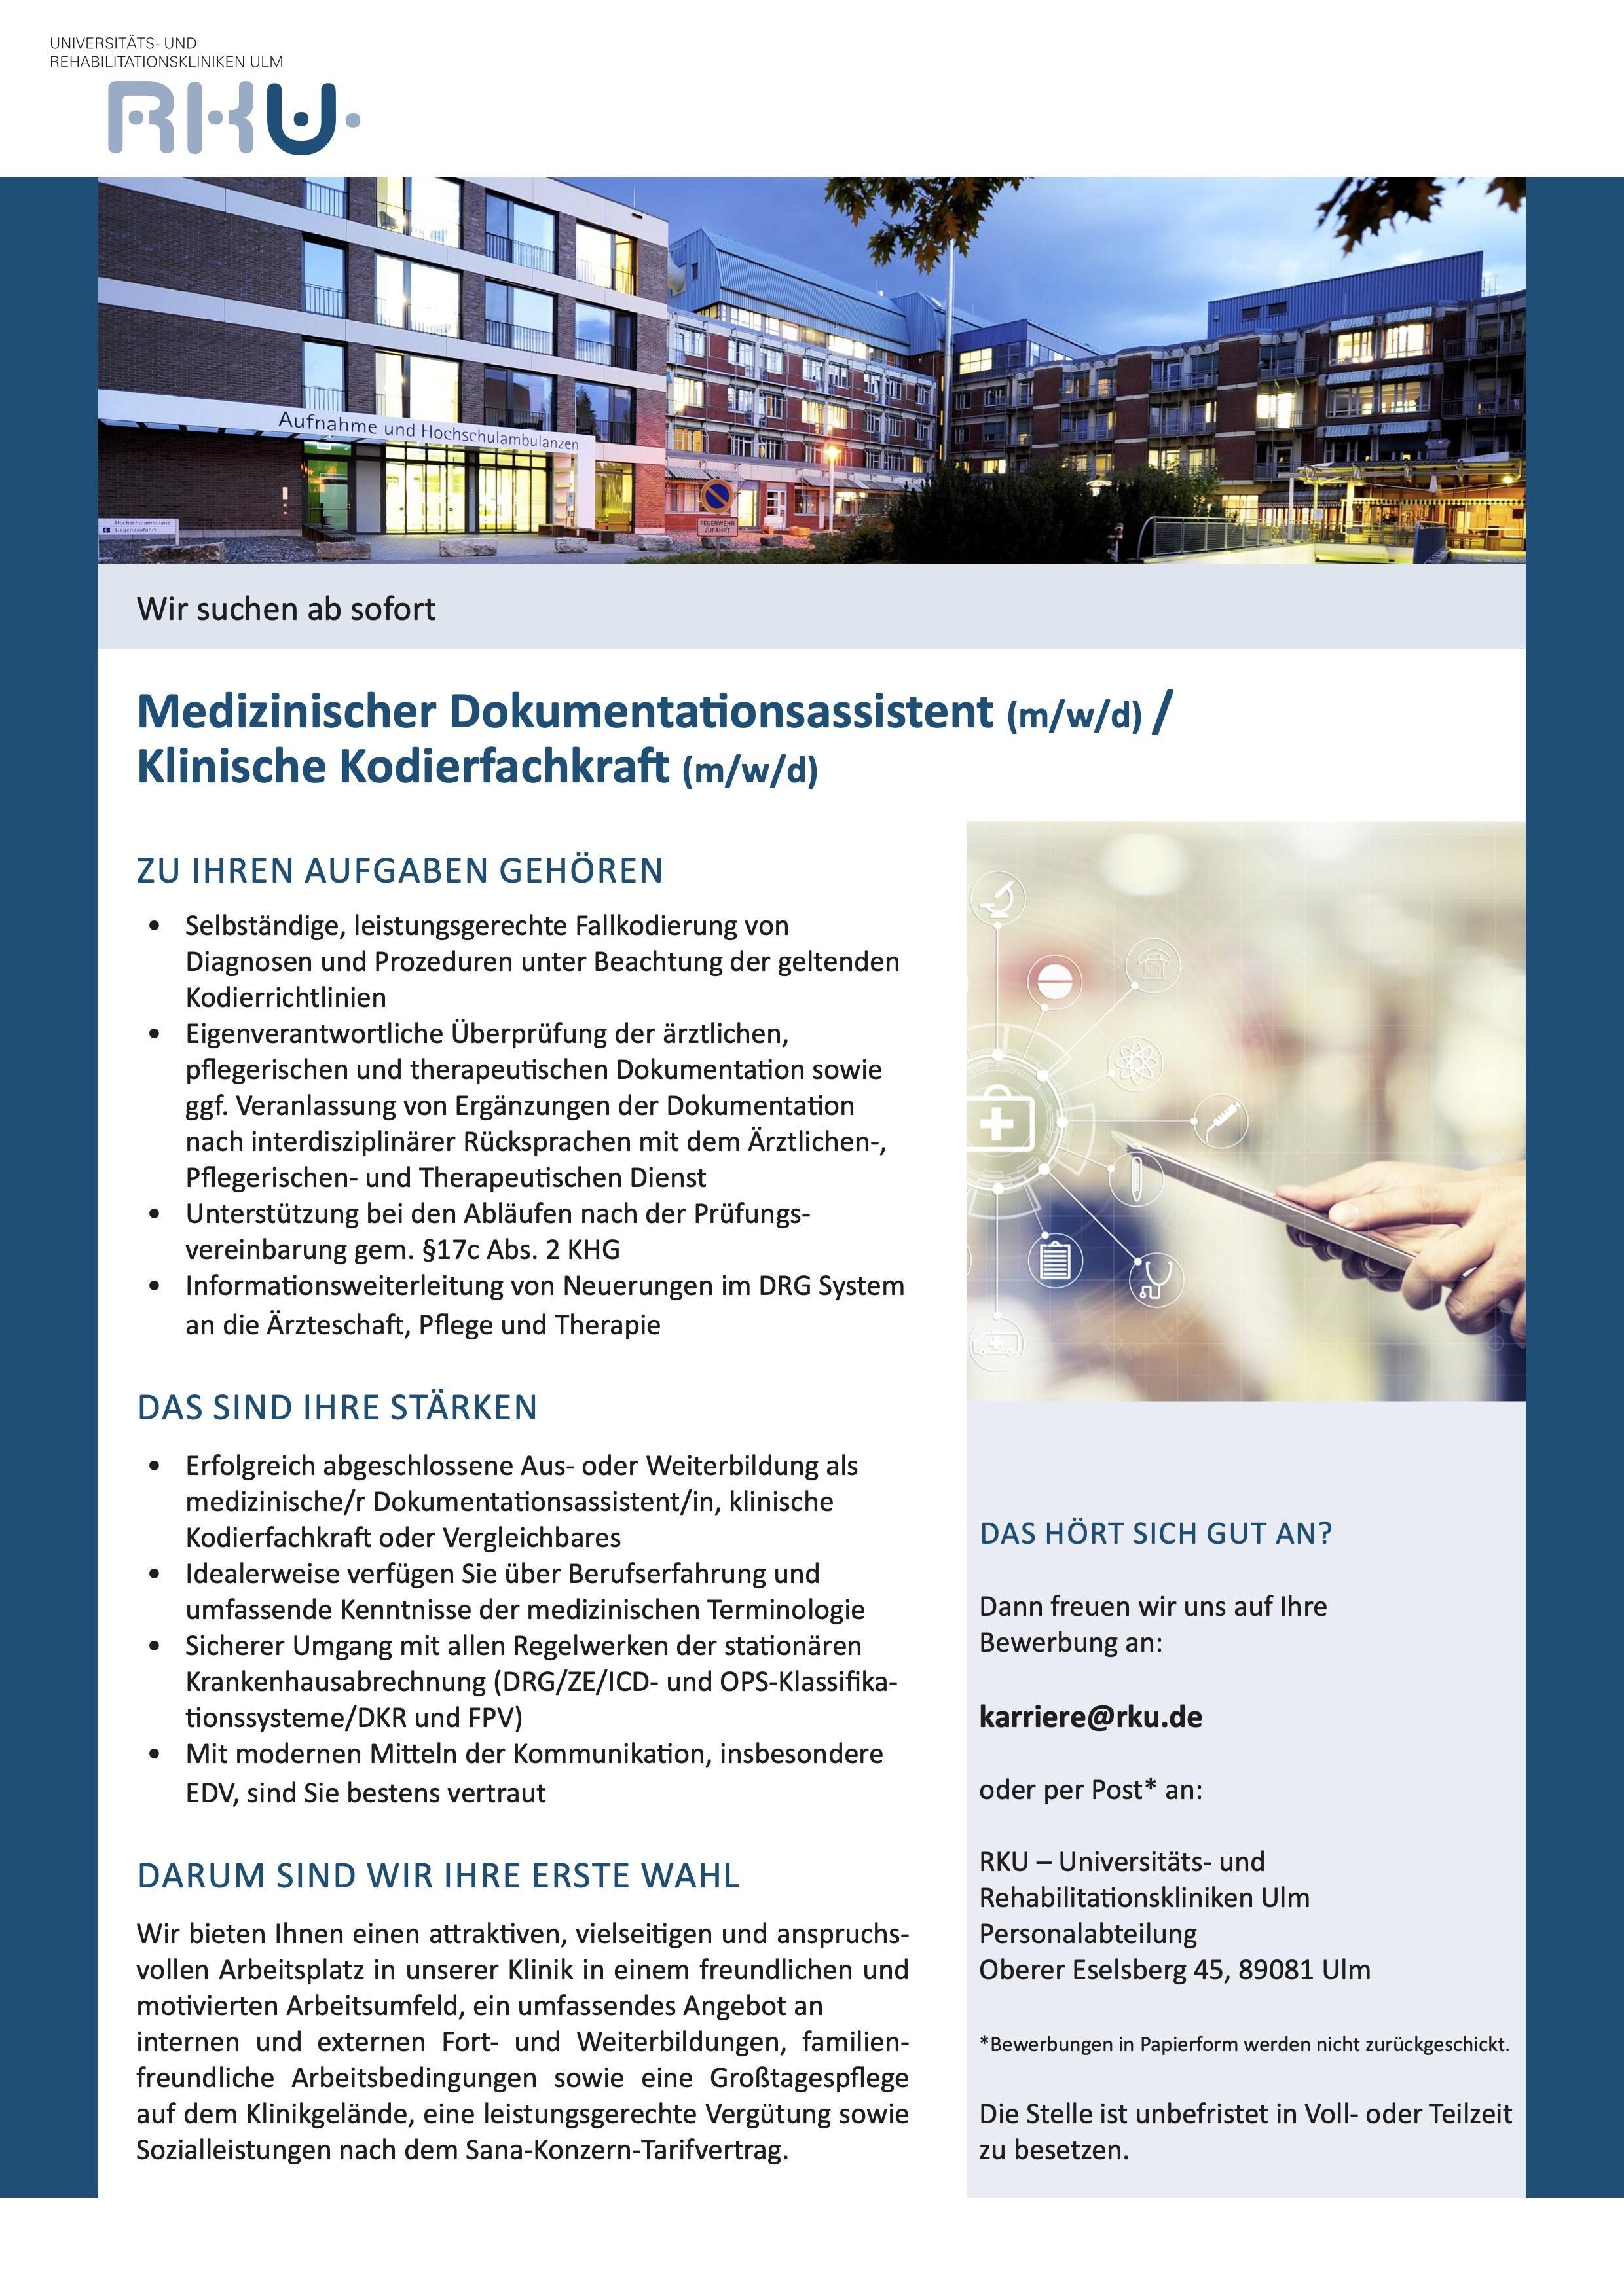 Medizinischer Dokumentationsassistent (m/w/d) / Klinische Kodierfachkraft (m/w/d)